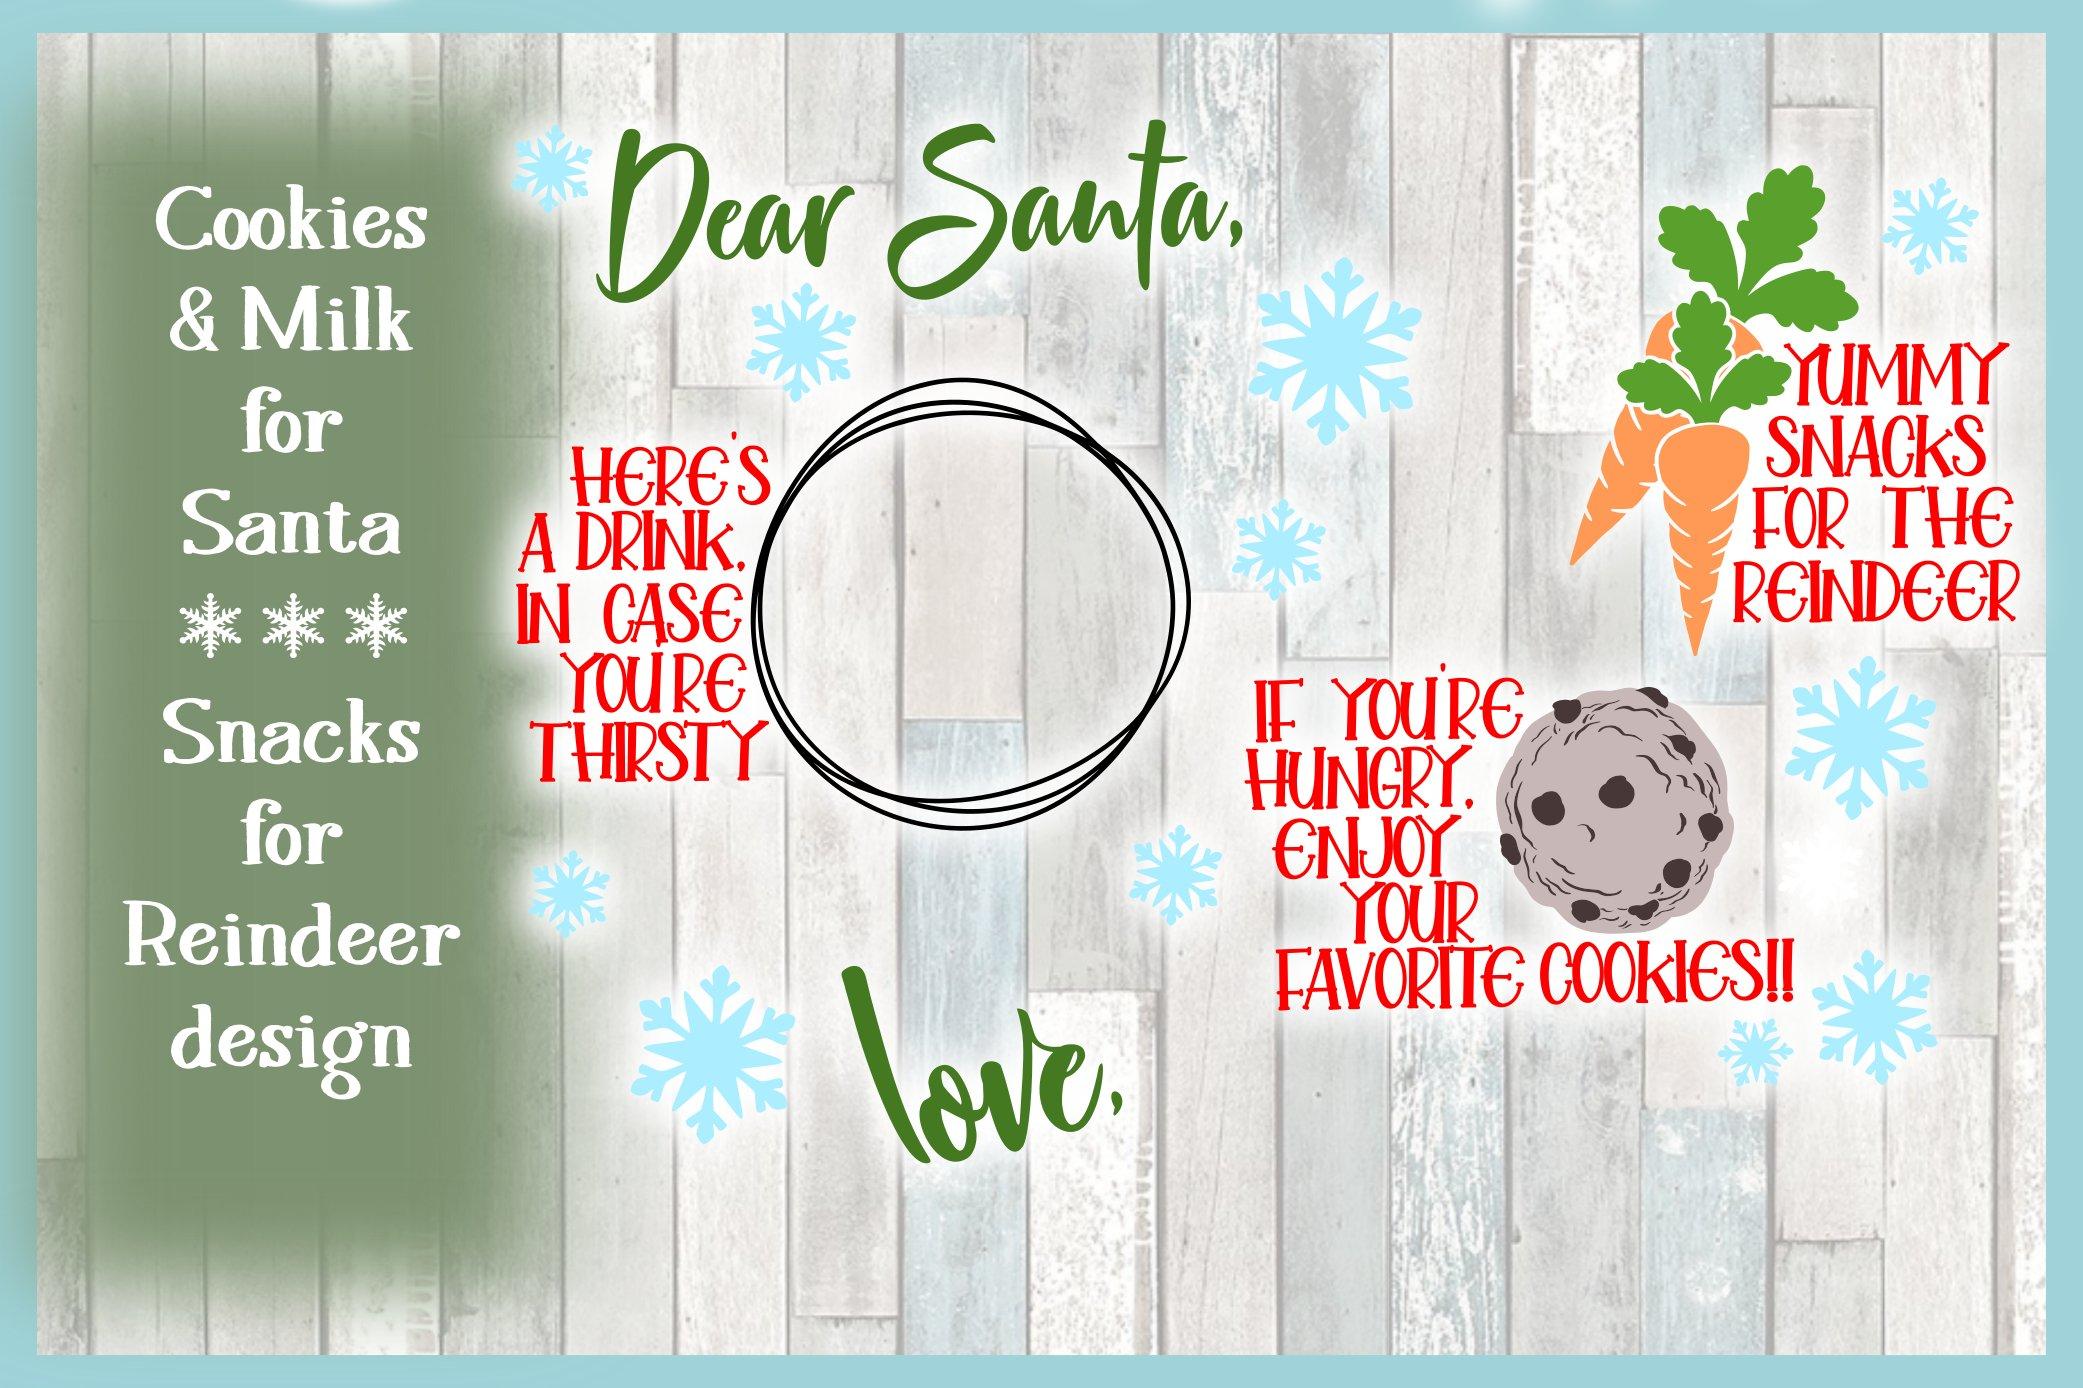 Dear Santa Milk And Cookies Christmas Eve Plate Svg 376229 Cut Files Design Bundles